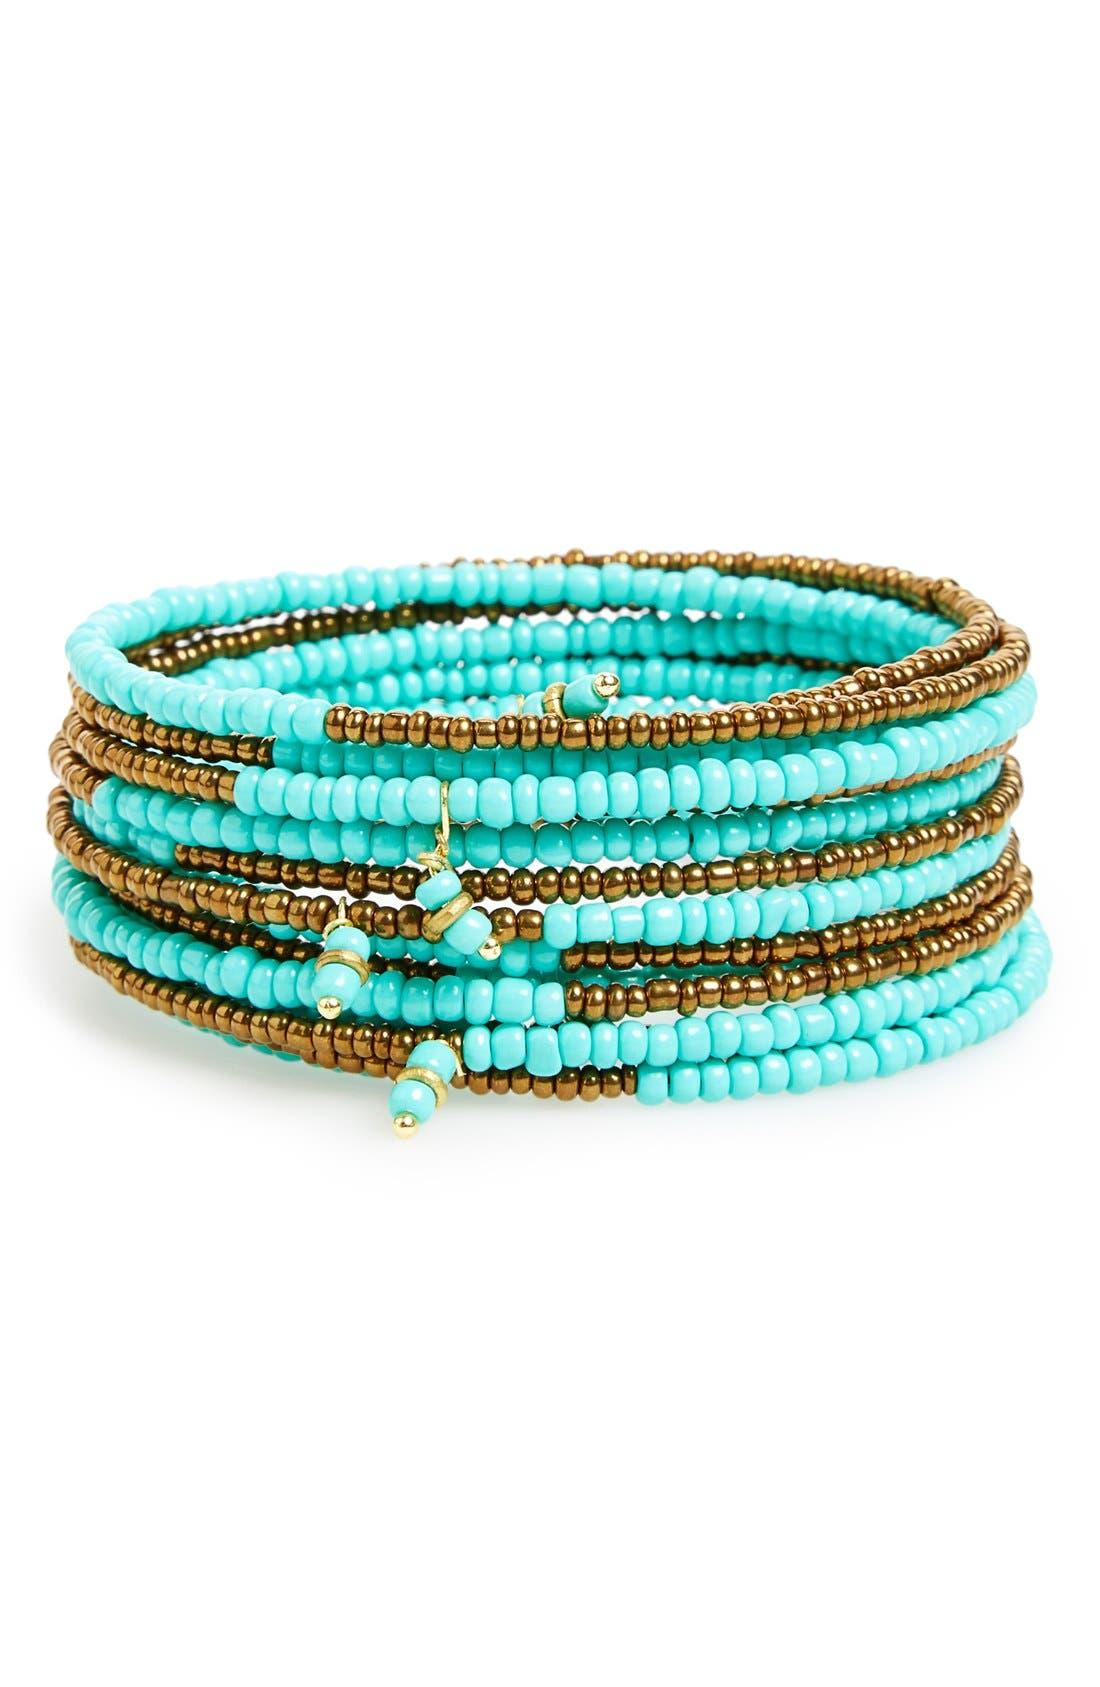 Alternate Image 1 Selected - Me to We Artisans 'Kitanzi' Beaded Bracelet